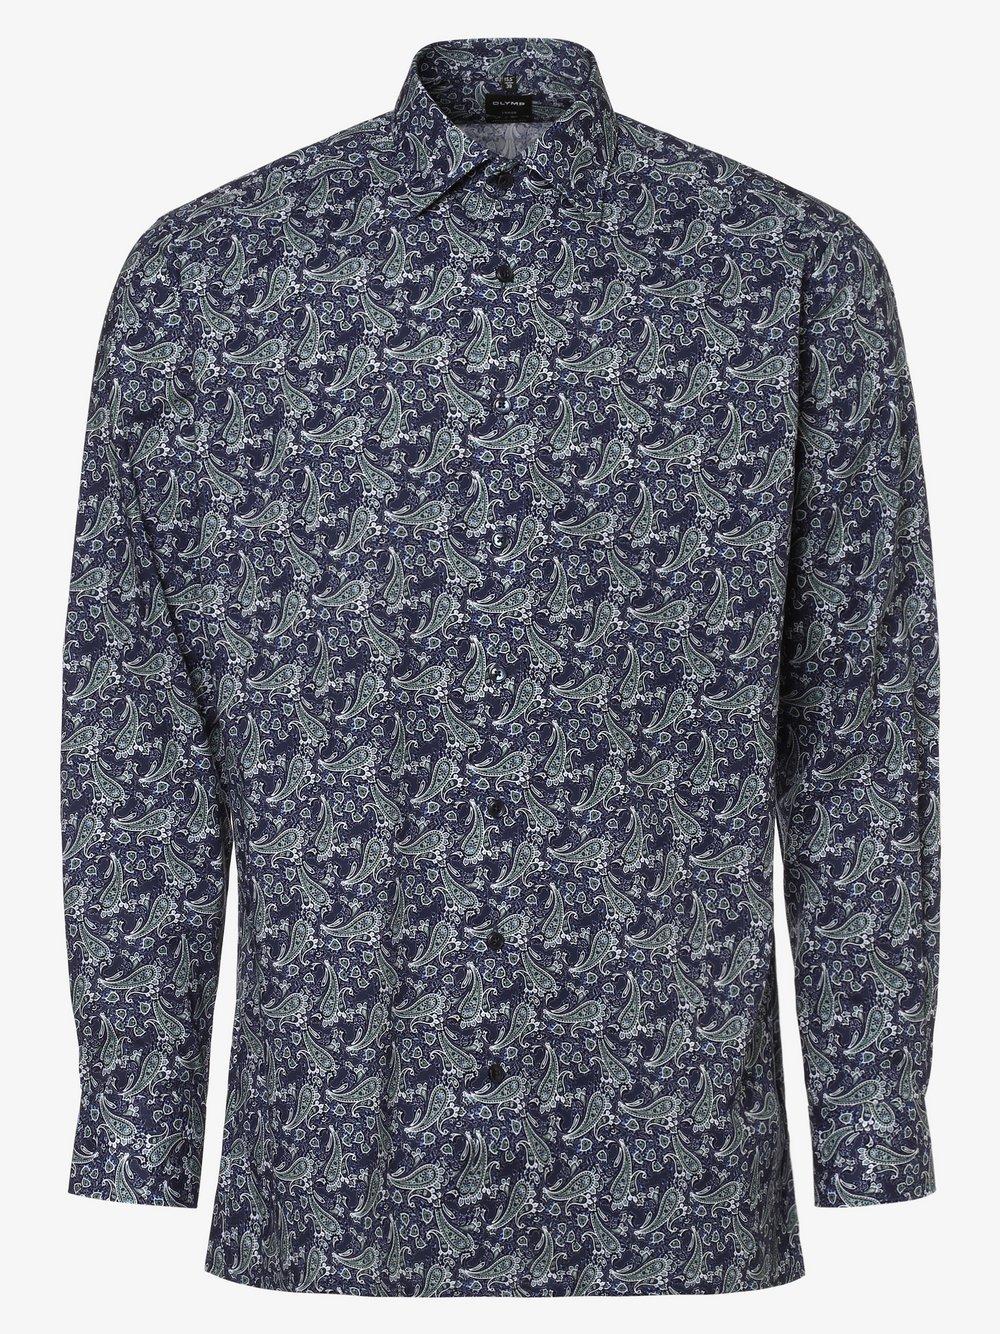 OLYMP Luxor modern Fit – Koszula męska – niewymagająca prasowania, niebieski Van Graaf 441783-0001-00390